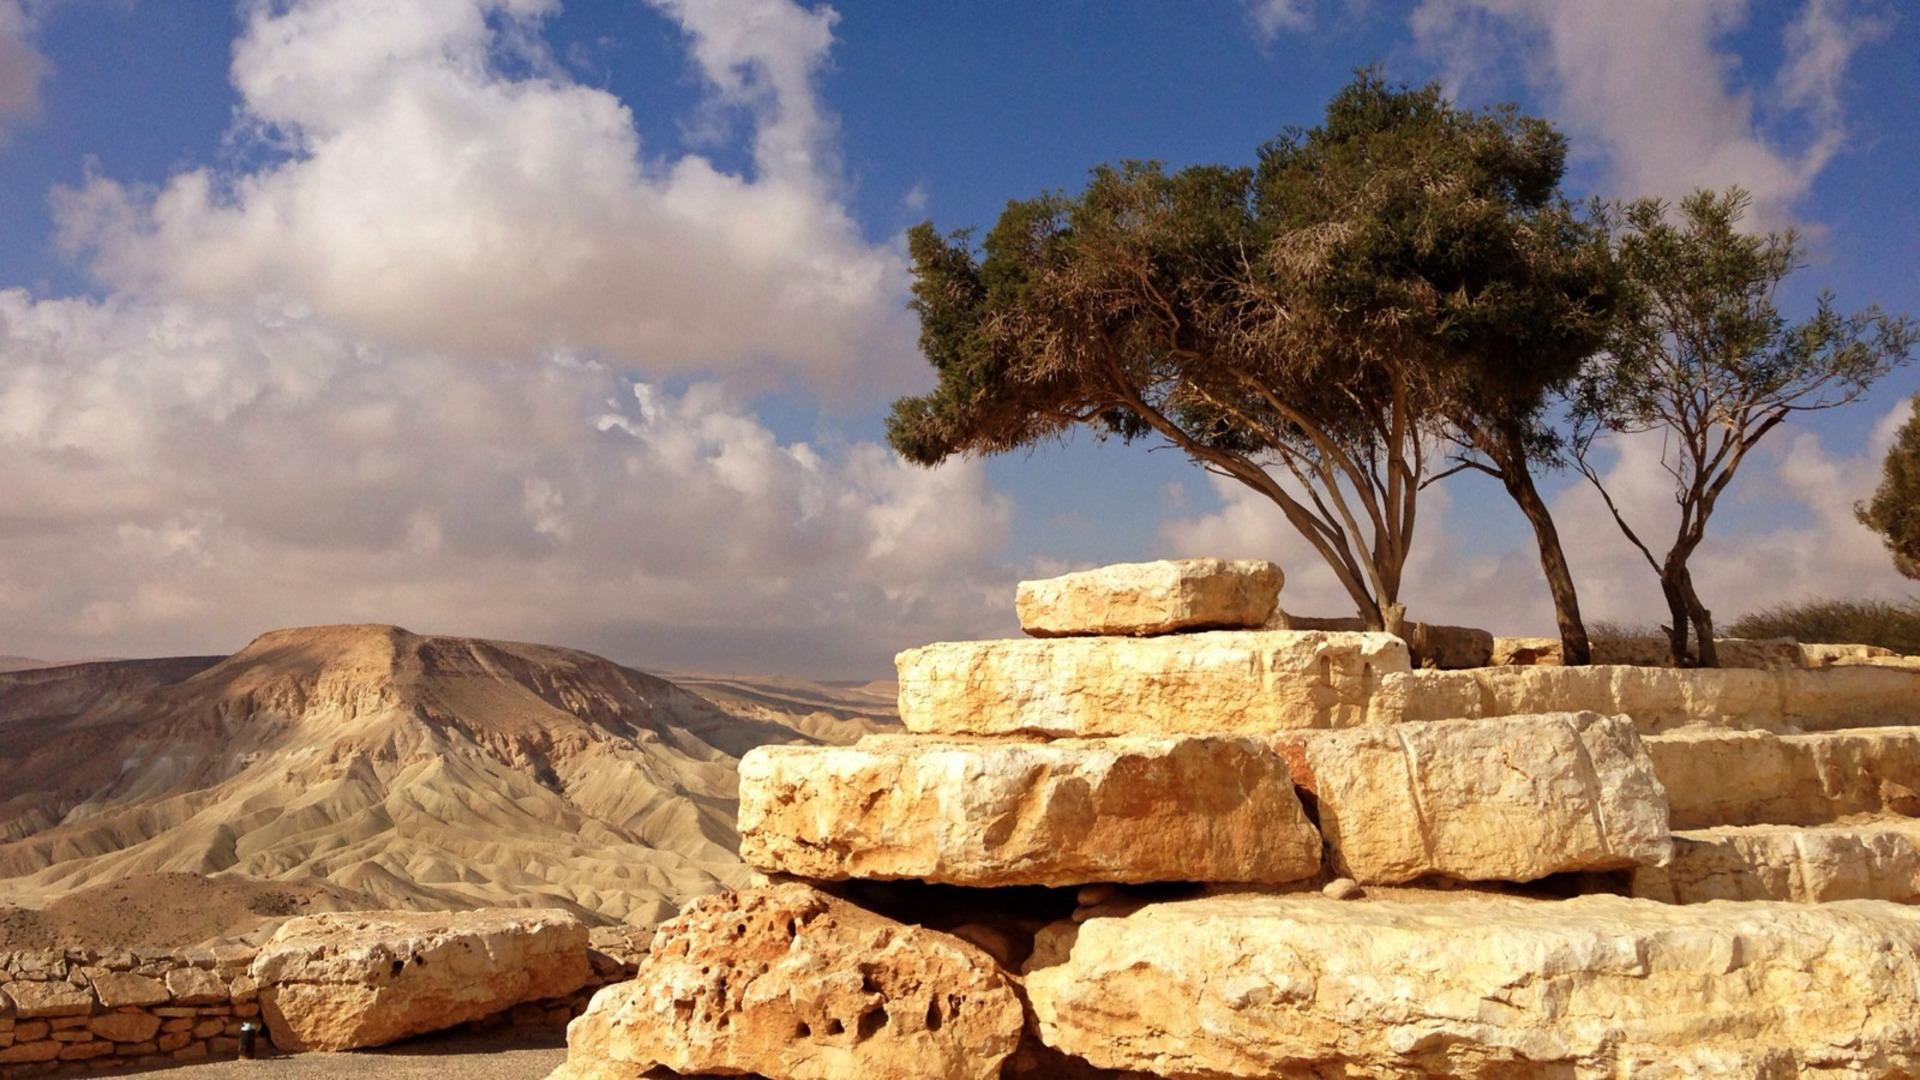 israel - HD1920×1080